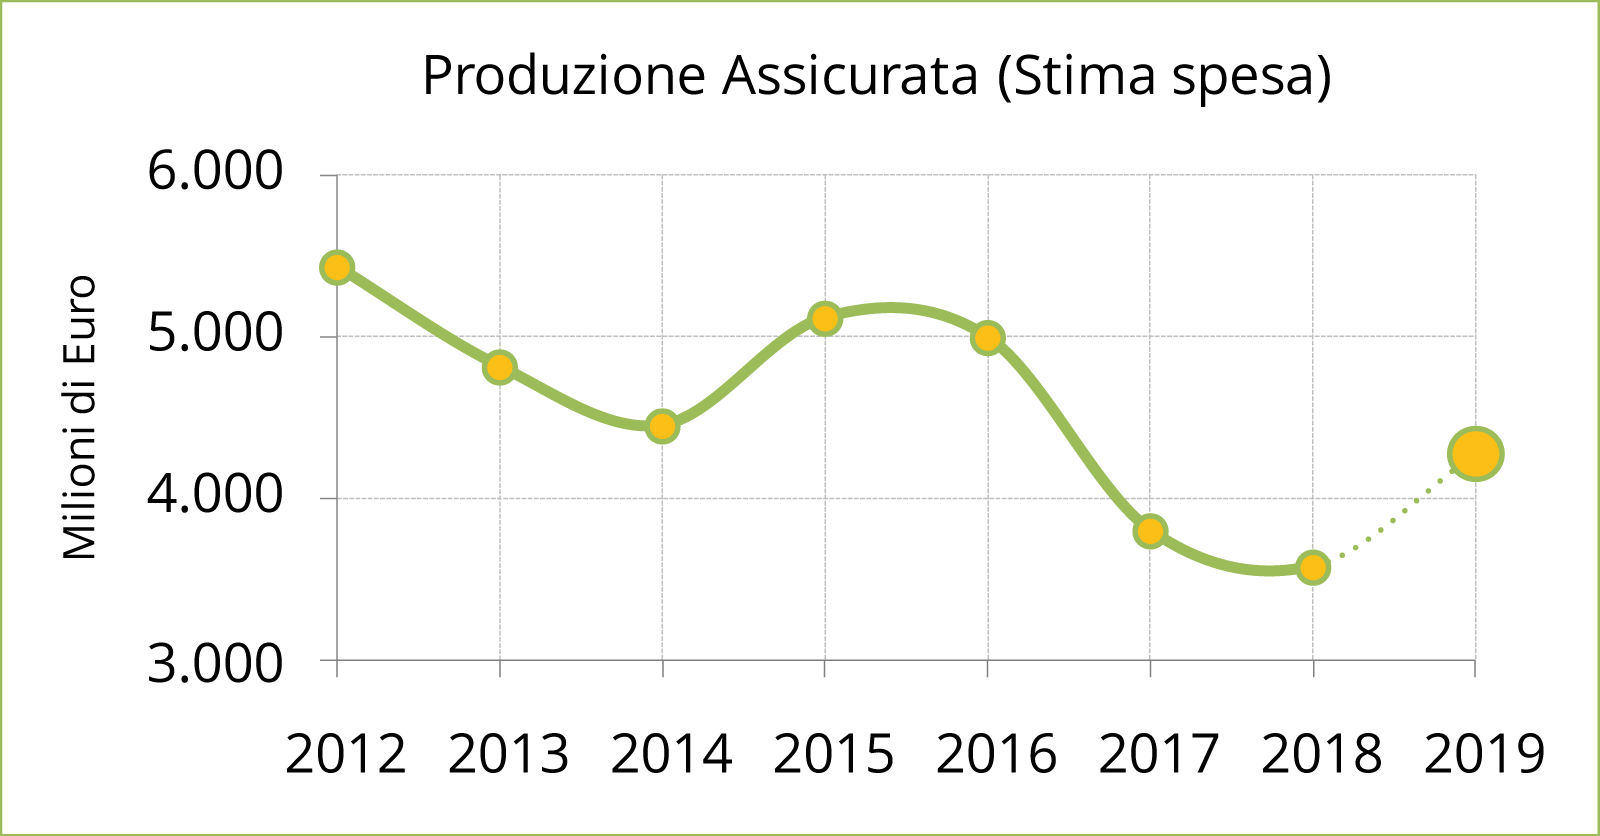 Toscana-in-cifre-Finanza-2019-cornice